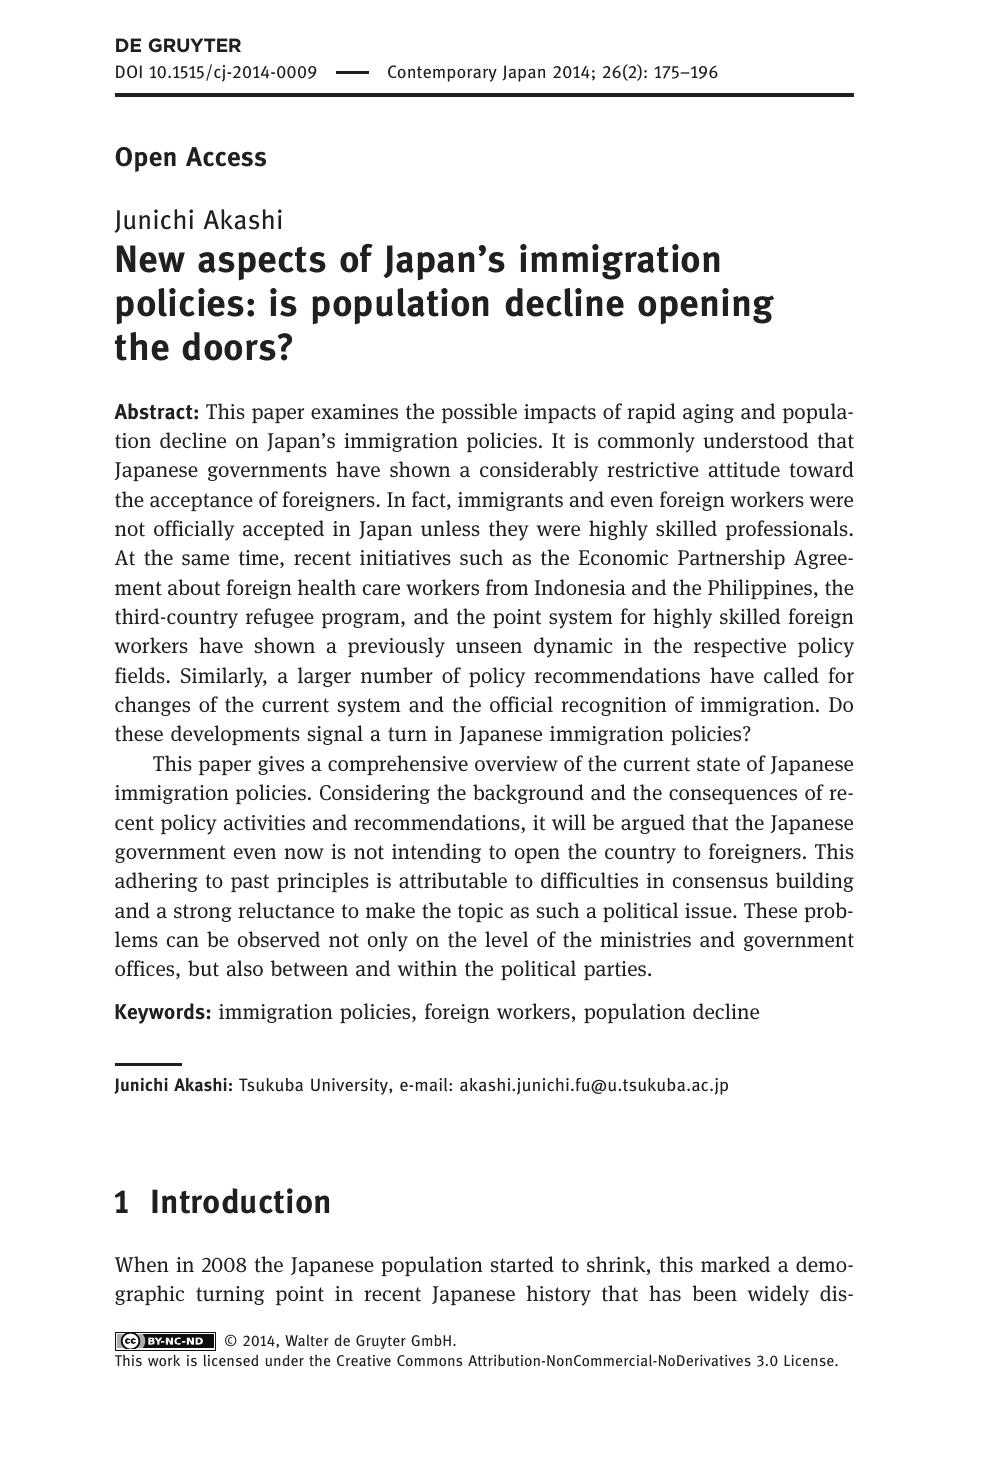 Short Essay on immigration